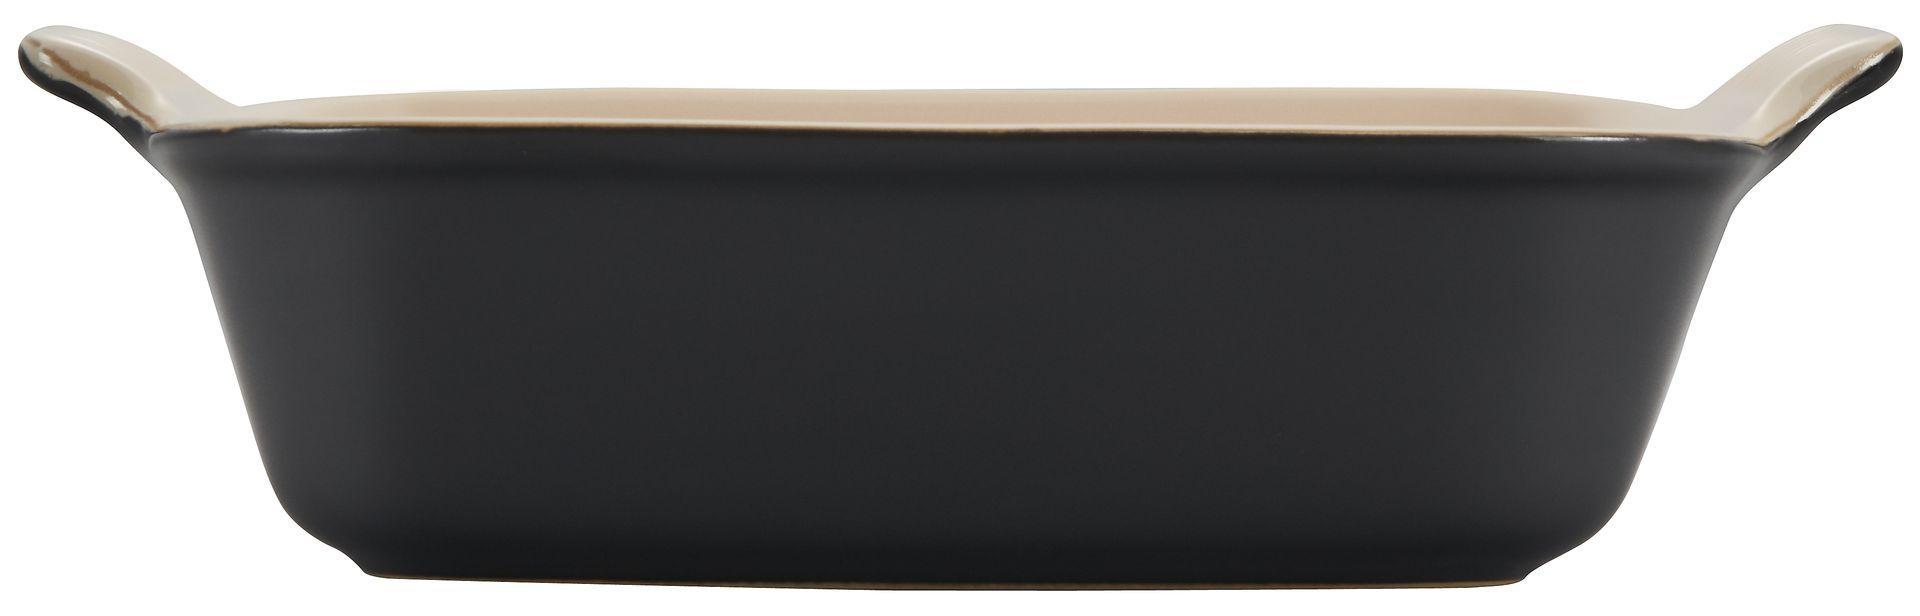 Le Creuset Auflaufform Tradition quadratisch 23 cm Schwarz